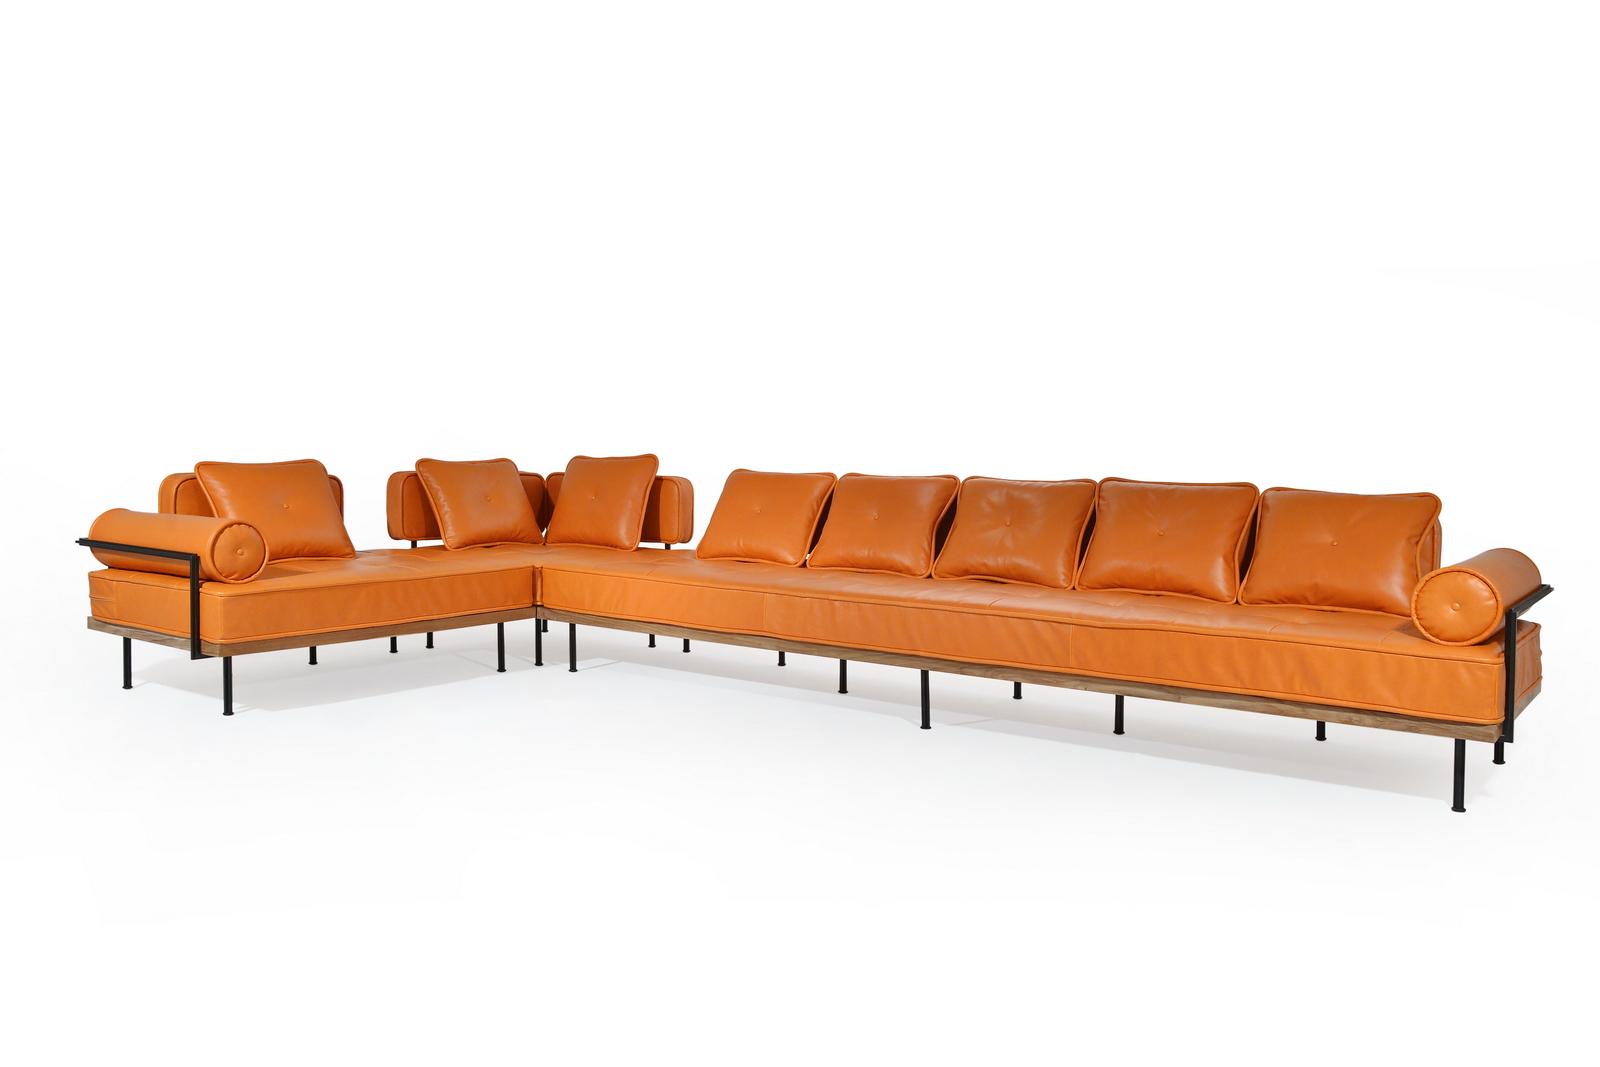 PTendercool-Sofa Corner-BS3-TE-BL-NO-Leather-210623-02